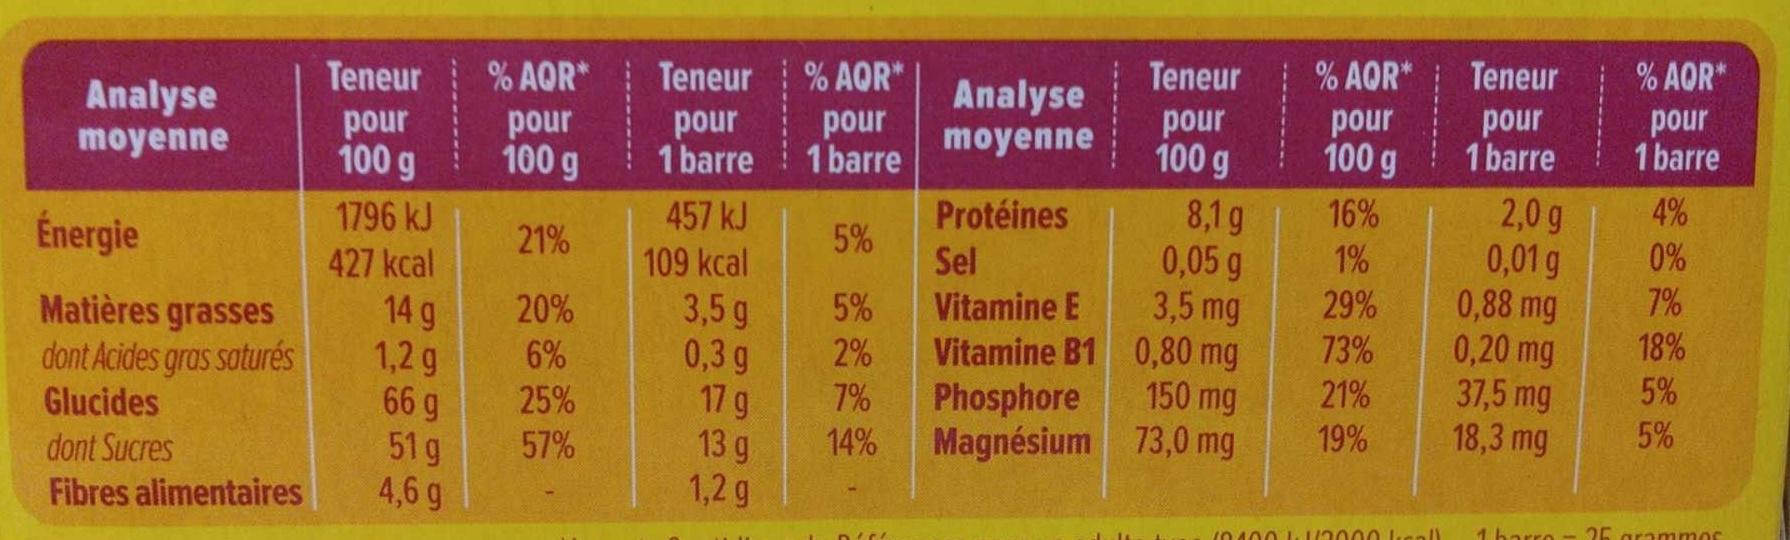 Barre Amande - Voedingswaarden - fr